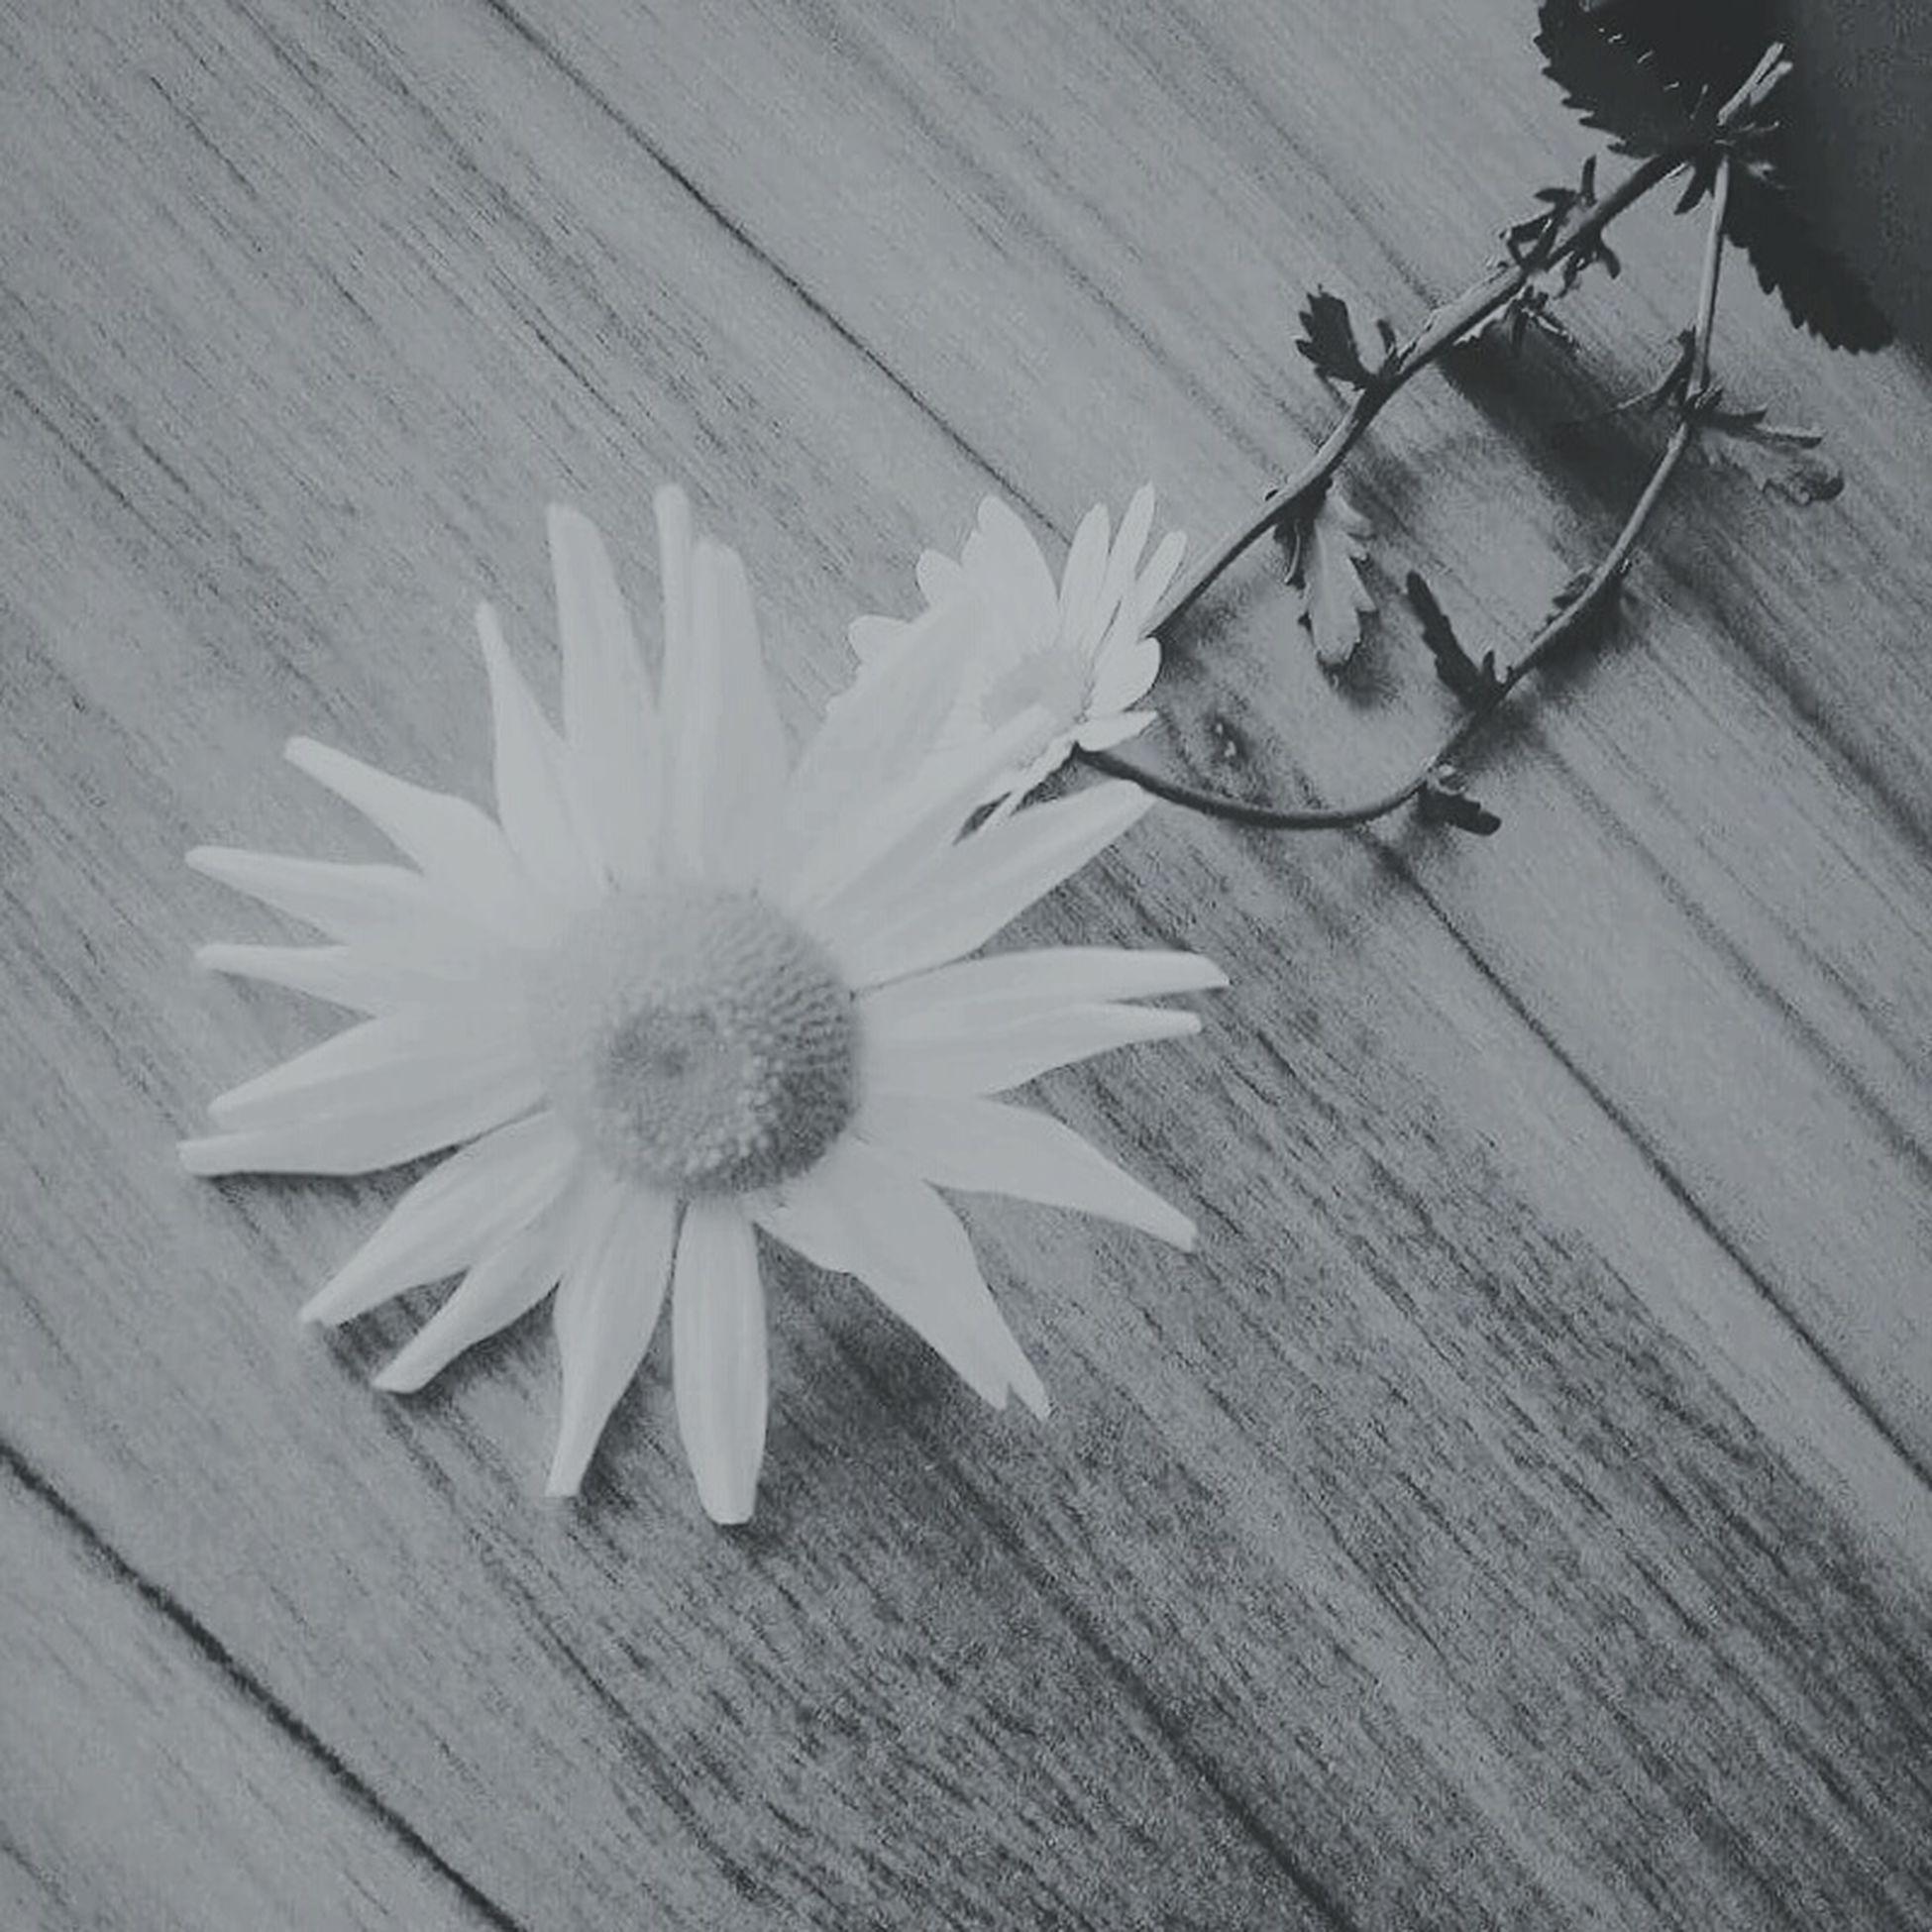 Seszynprofeszyn Flowers, Nature And Beauty Instagood Instalike Instaphoto Photooftheday First Eyeem Photo